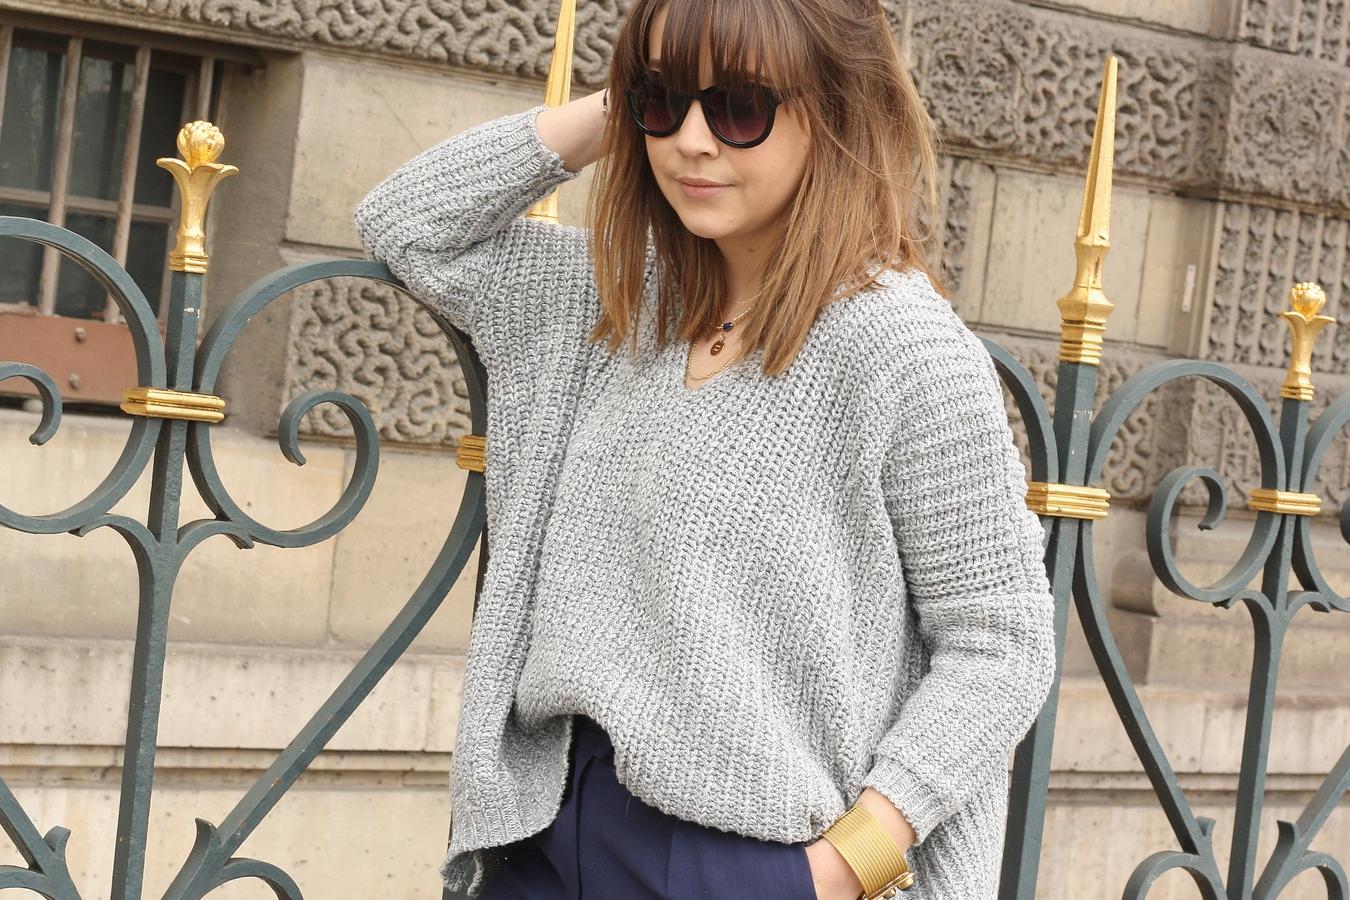 Blog mode femme Paris - Du style, Madame - Streetstyle - jupe culotte